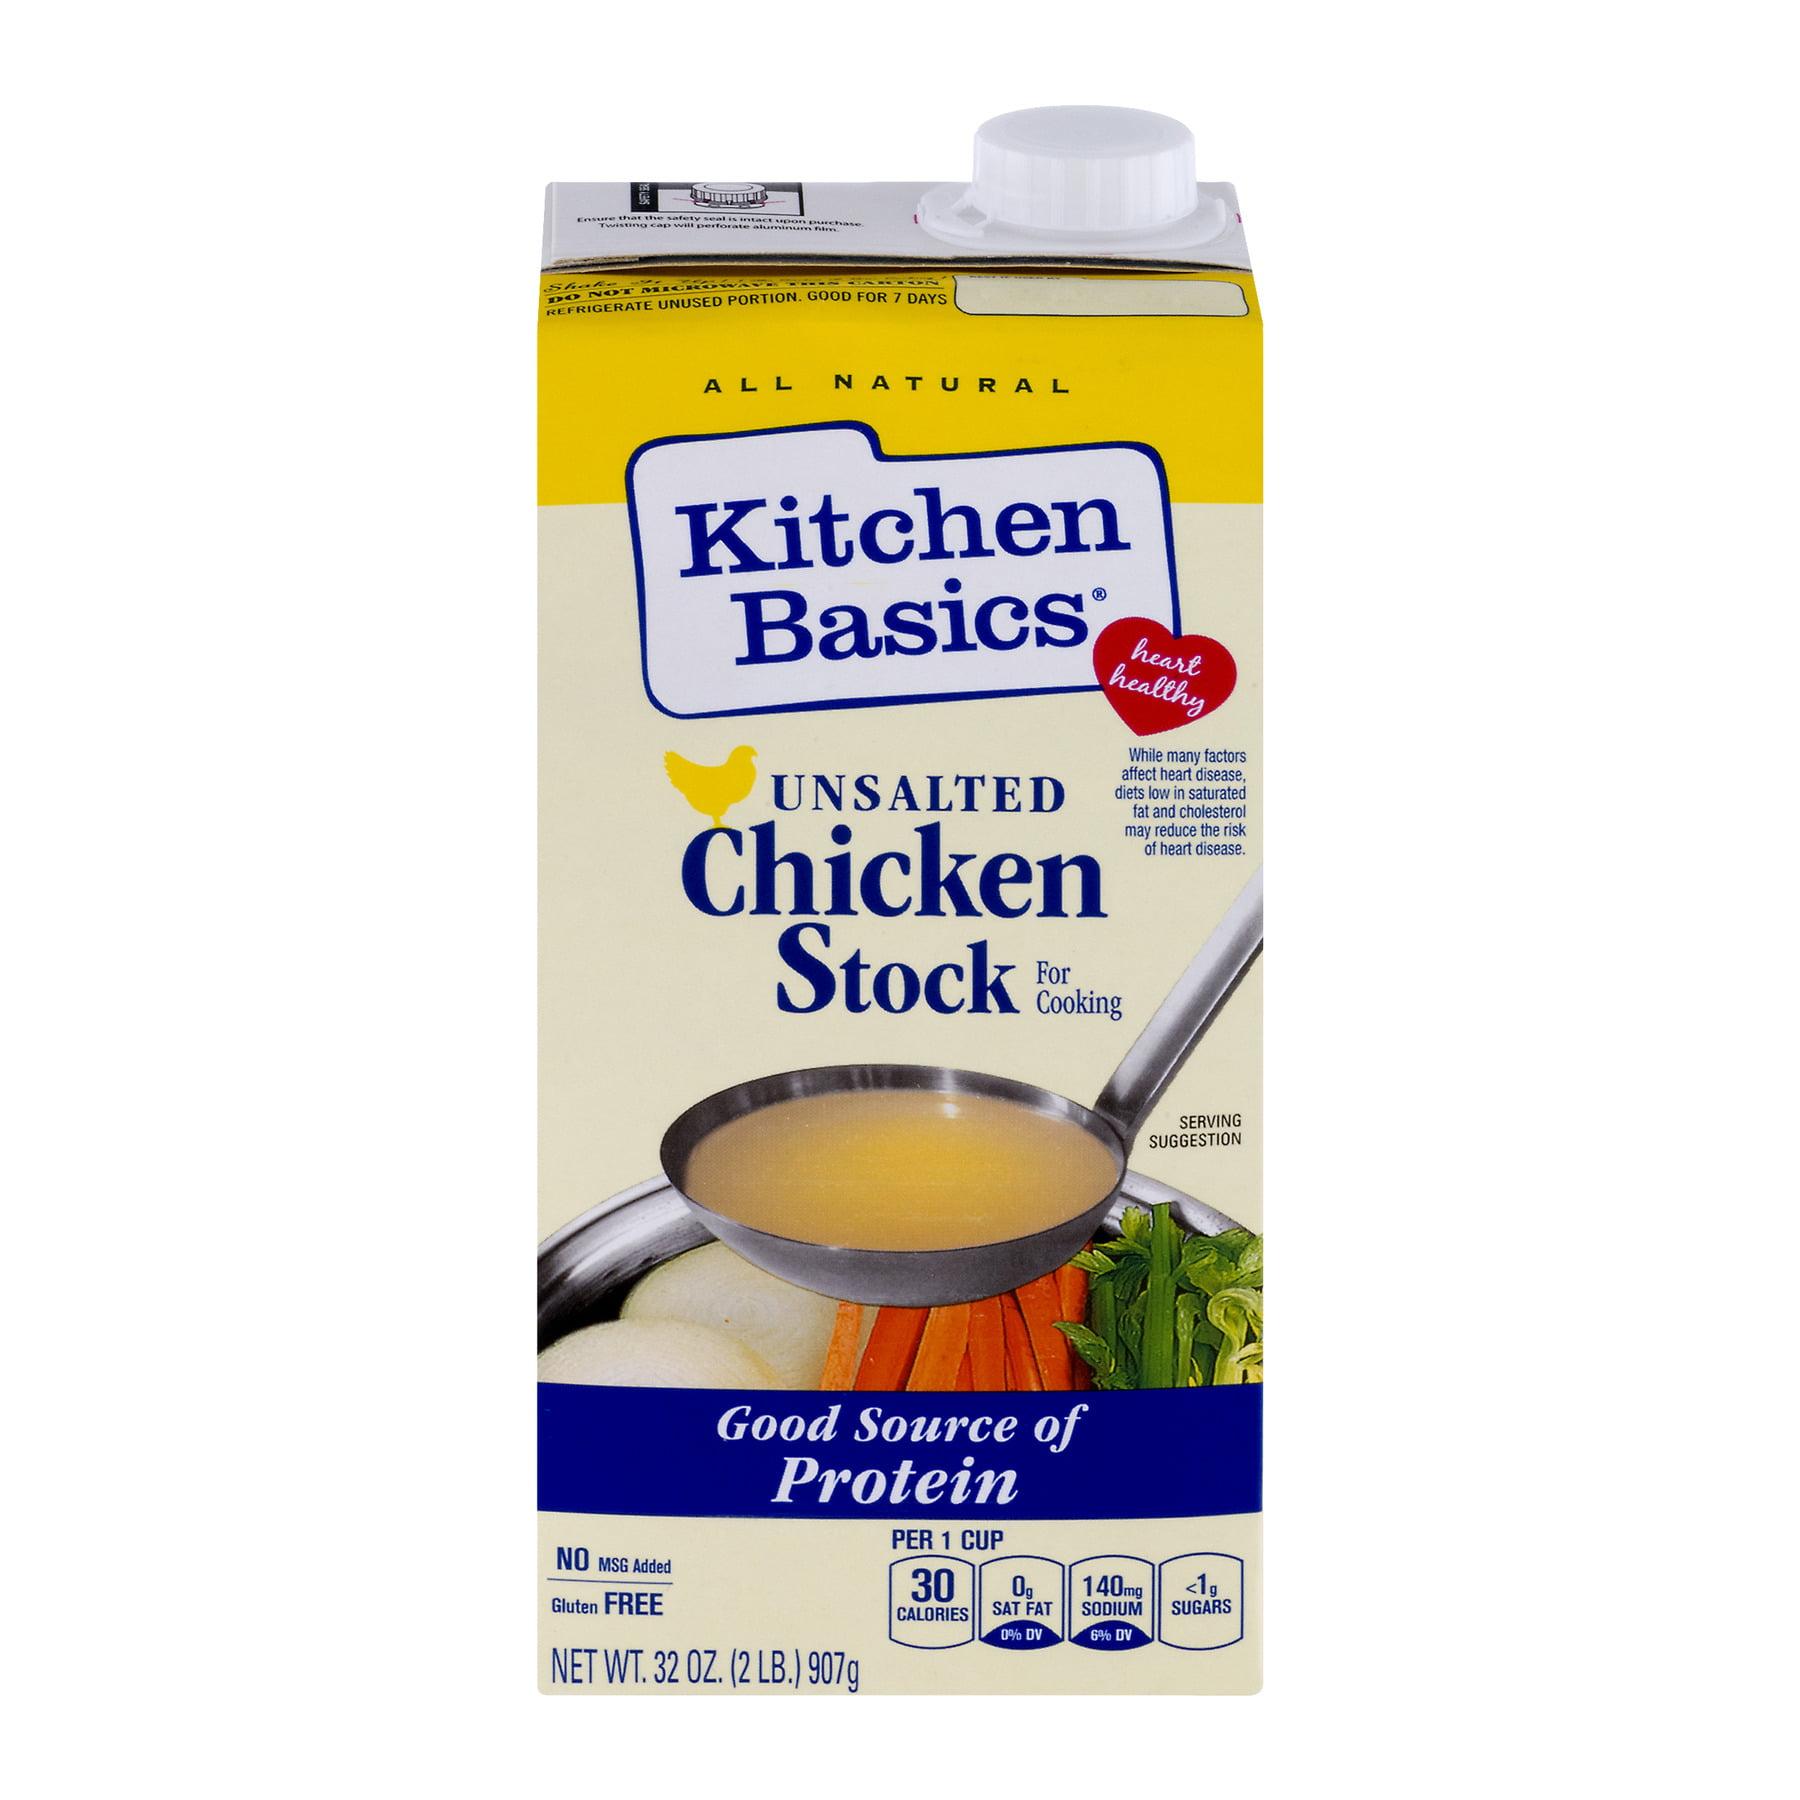 Kitchen Basics® All Natural Unsalted Chicken Stock, 32 oz